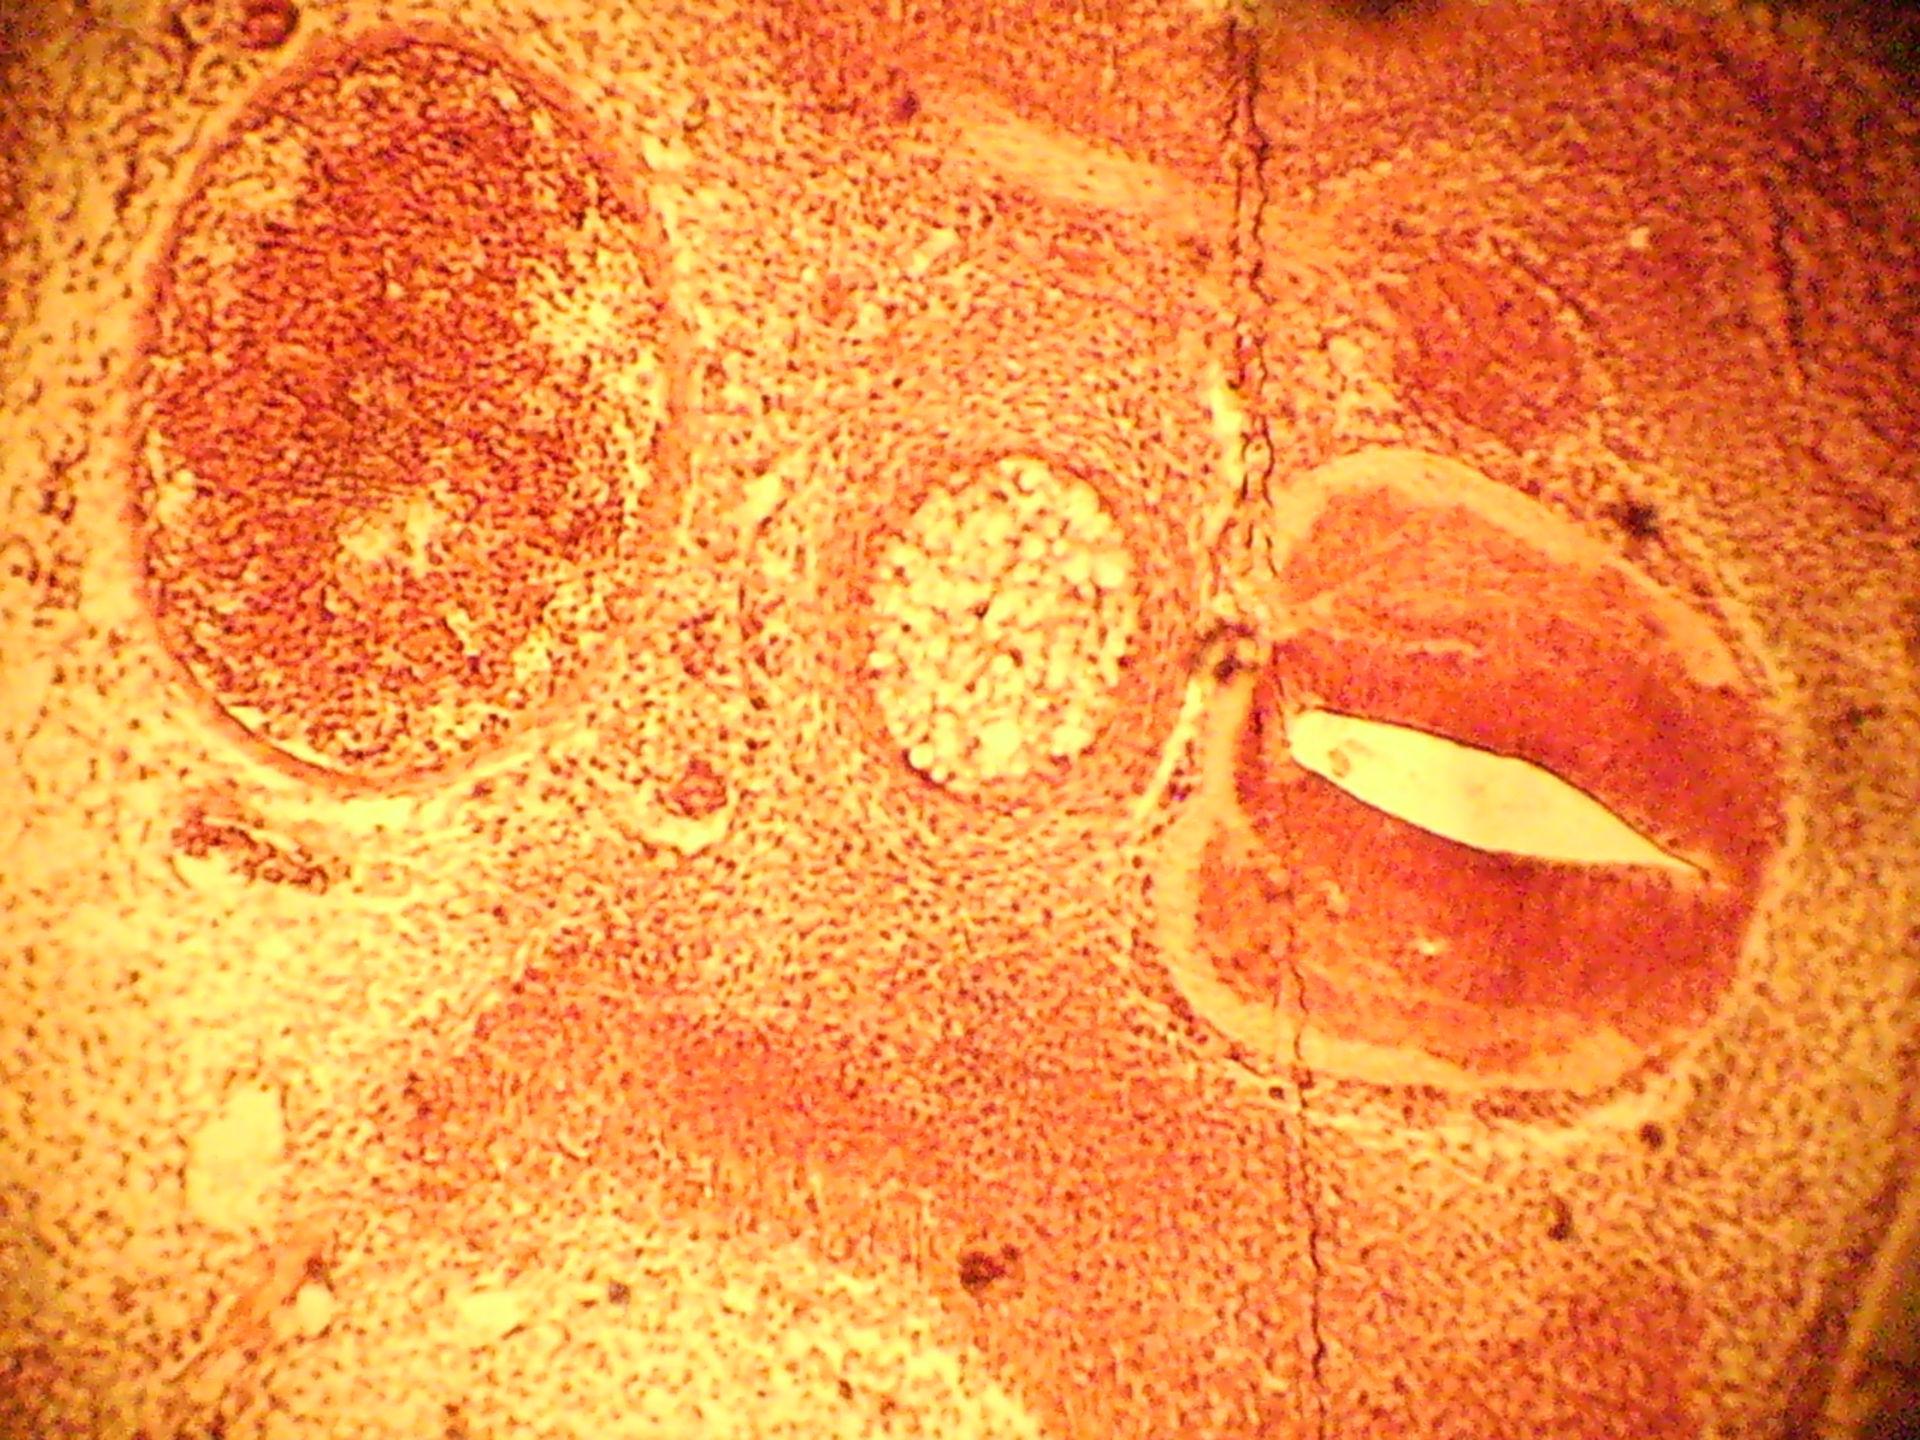 Hühnchenembryo